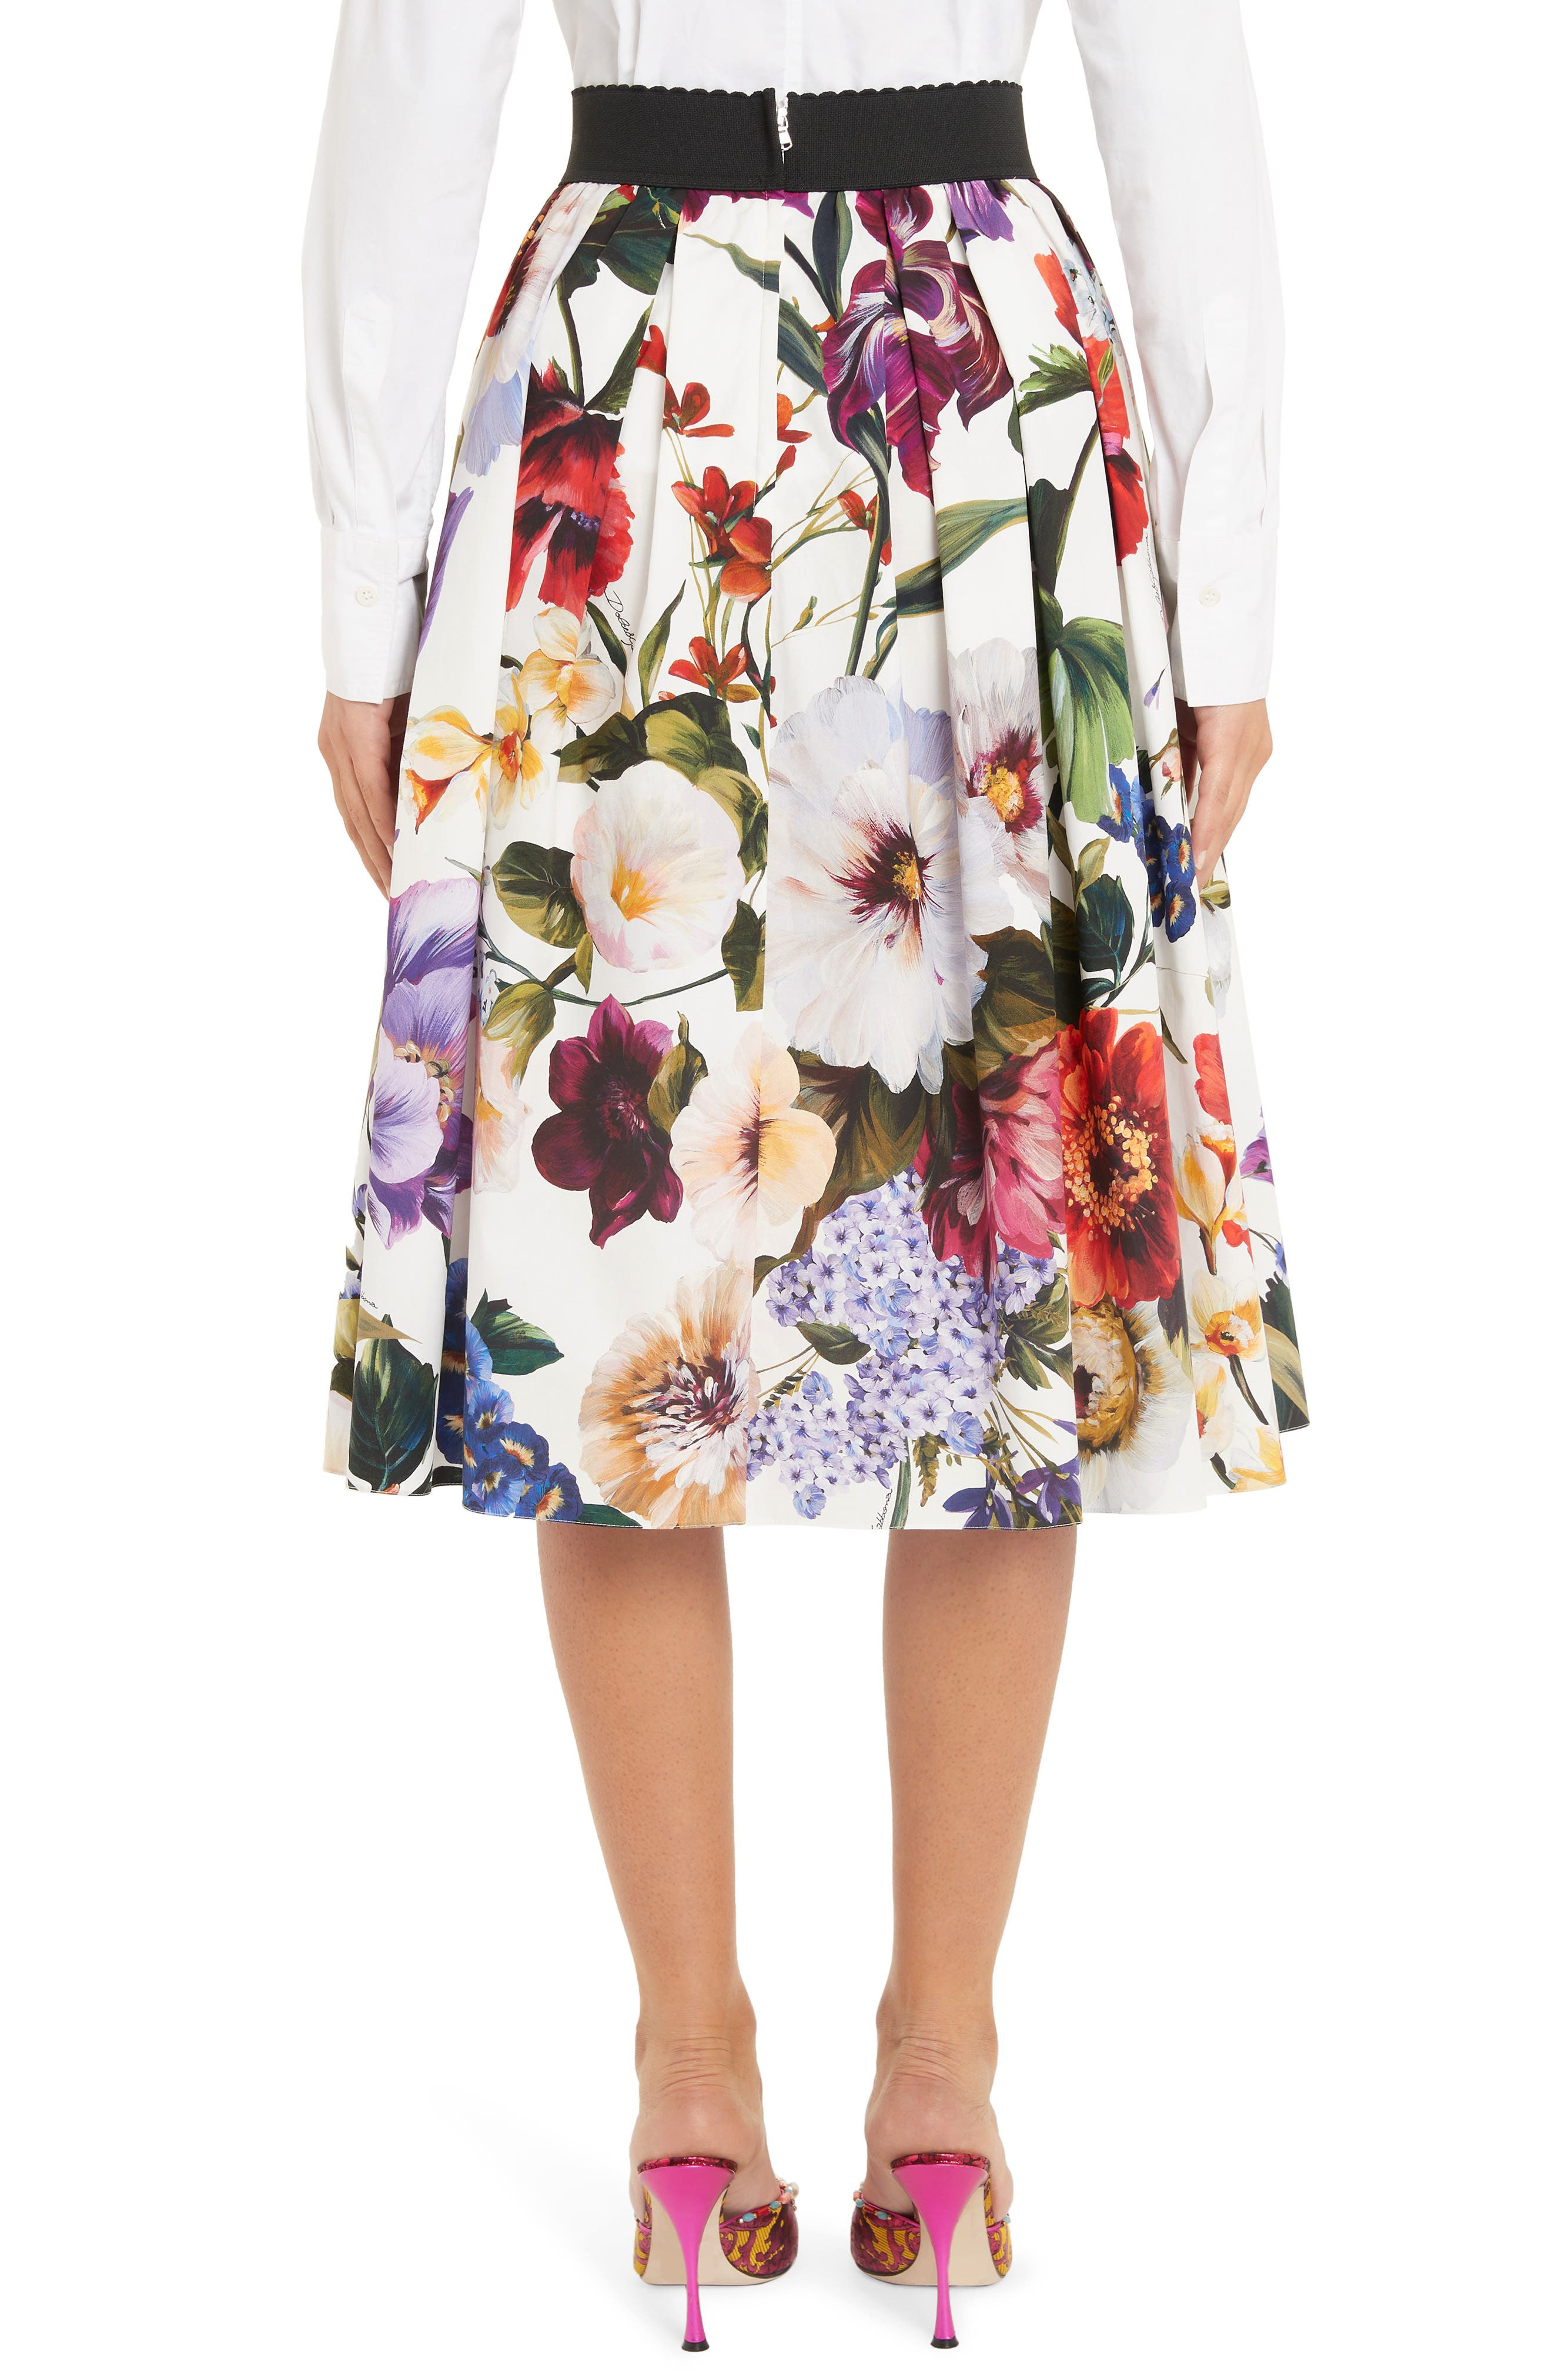 DOLCE&GABBANA, Floral Print A-Line Poplin Midi Skirt, Alternate thumbnail 2, color, PRINT